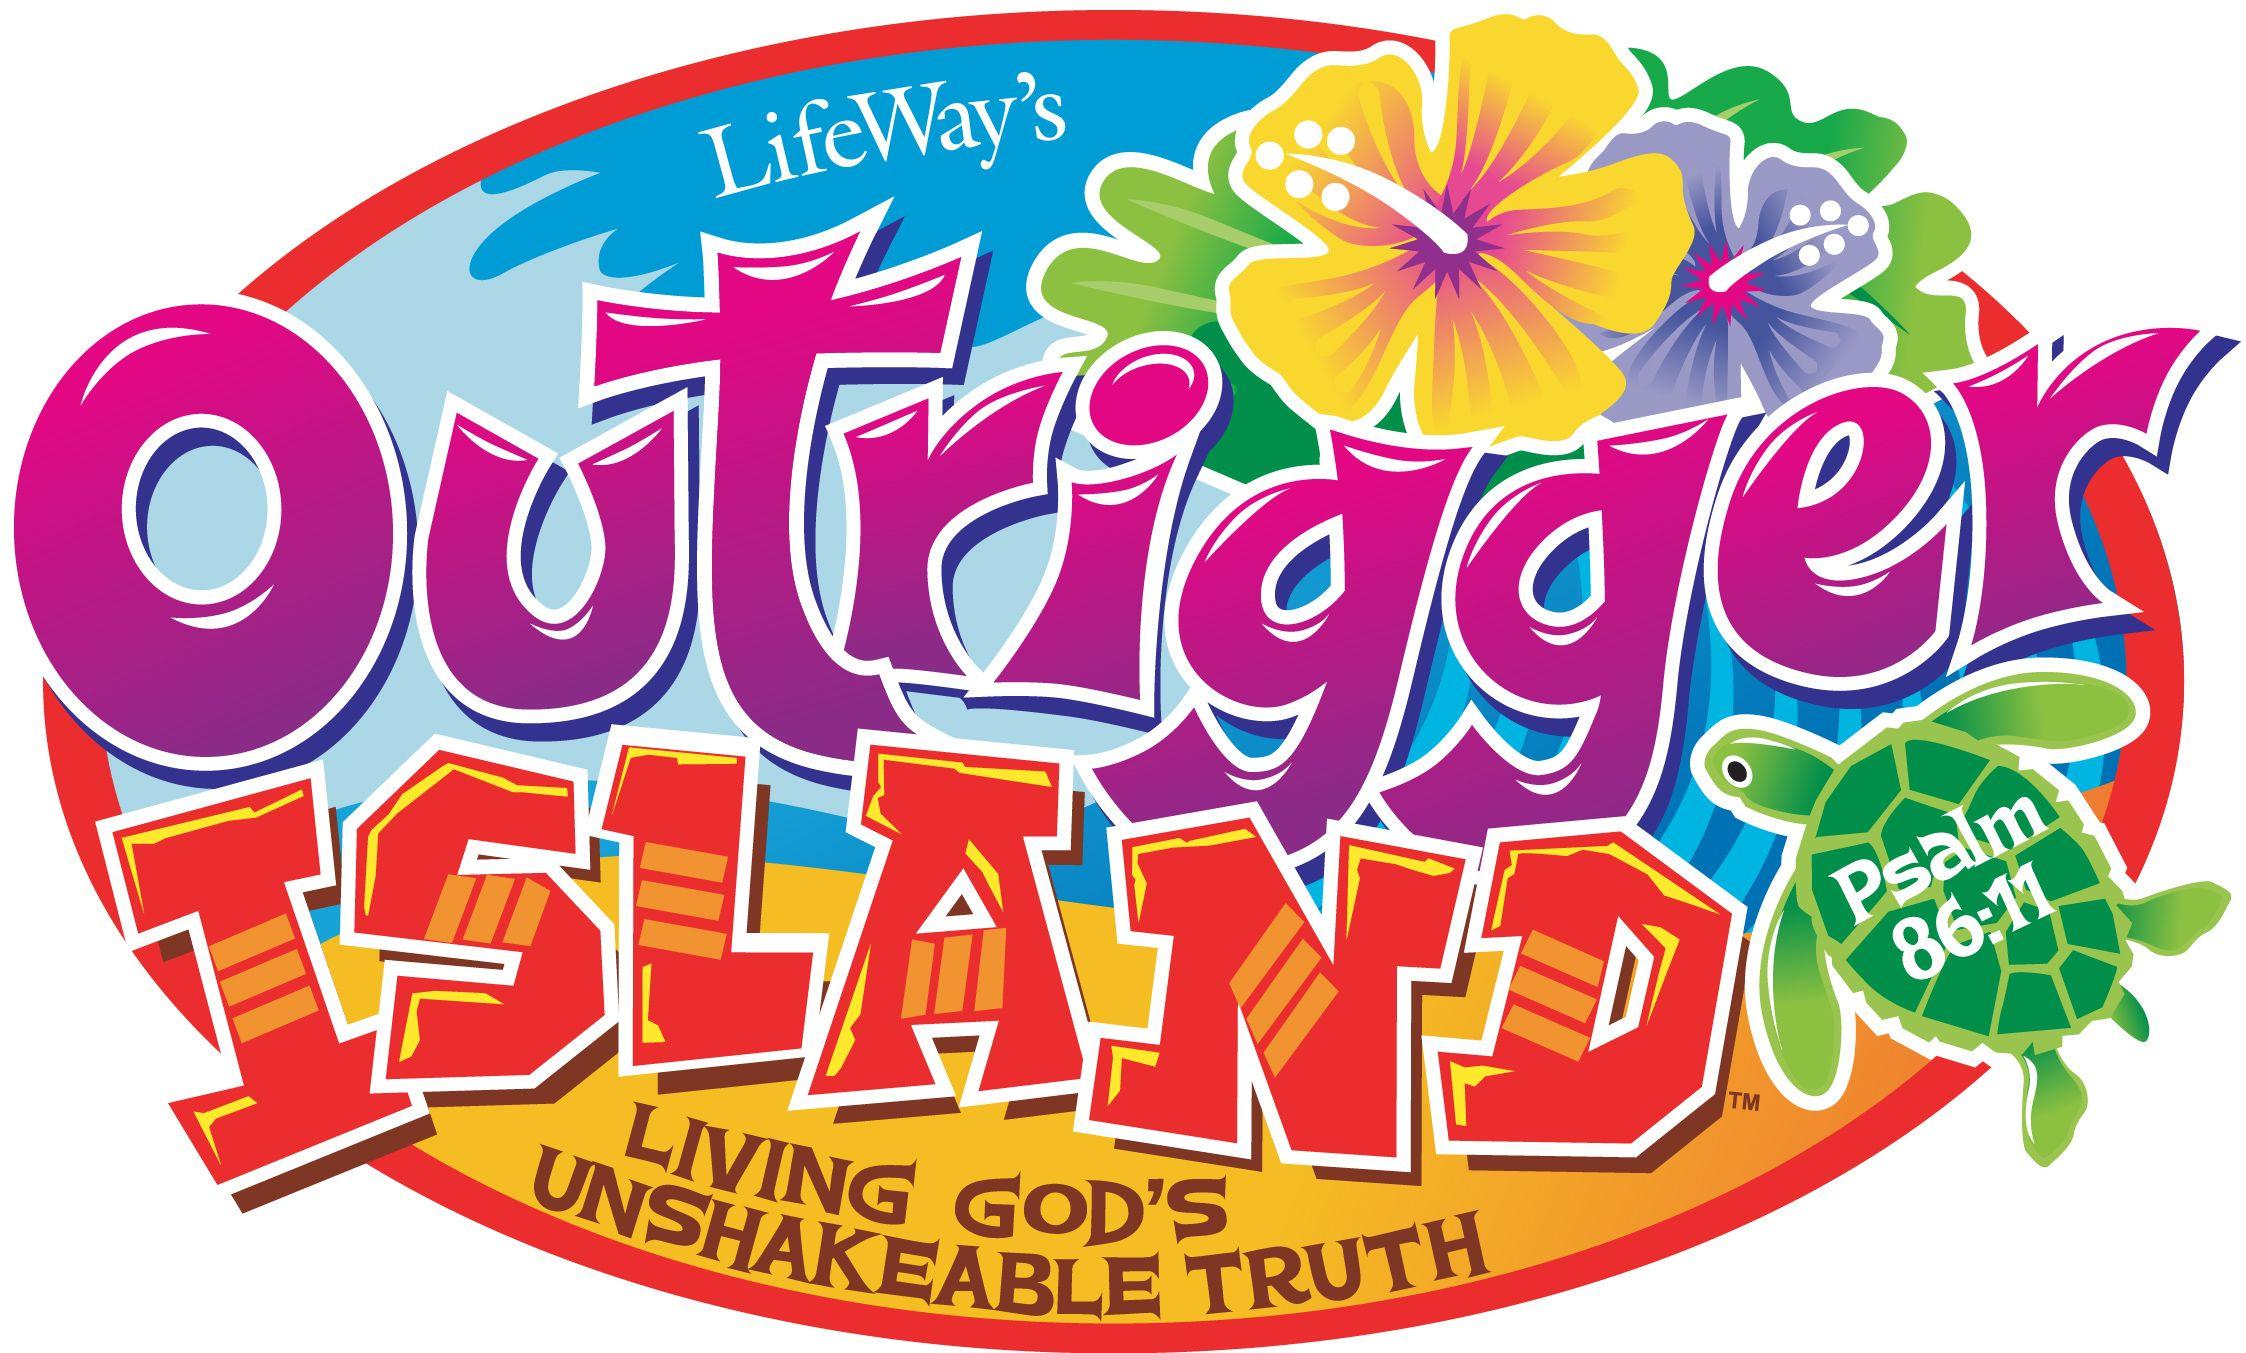 outrigger island vbs logo vacation bible school 2015 pinterest rh pinterest com